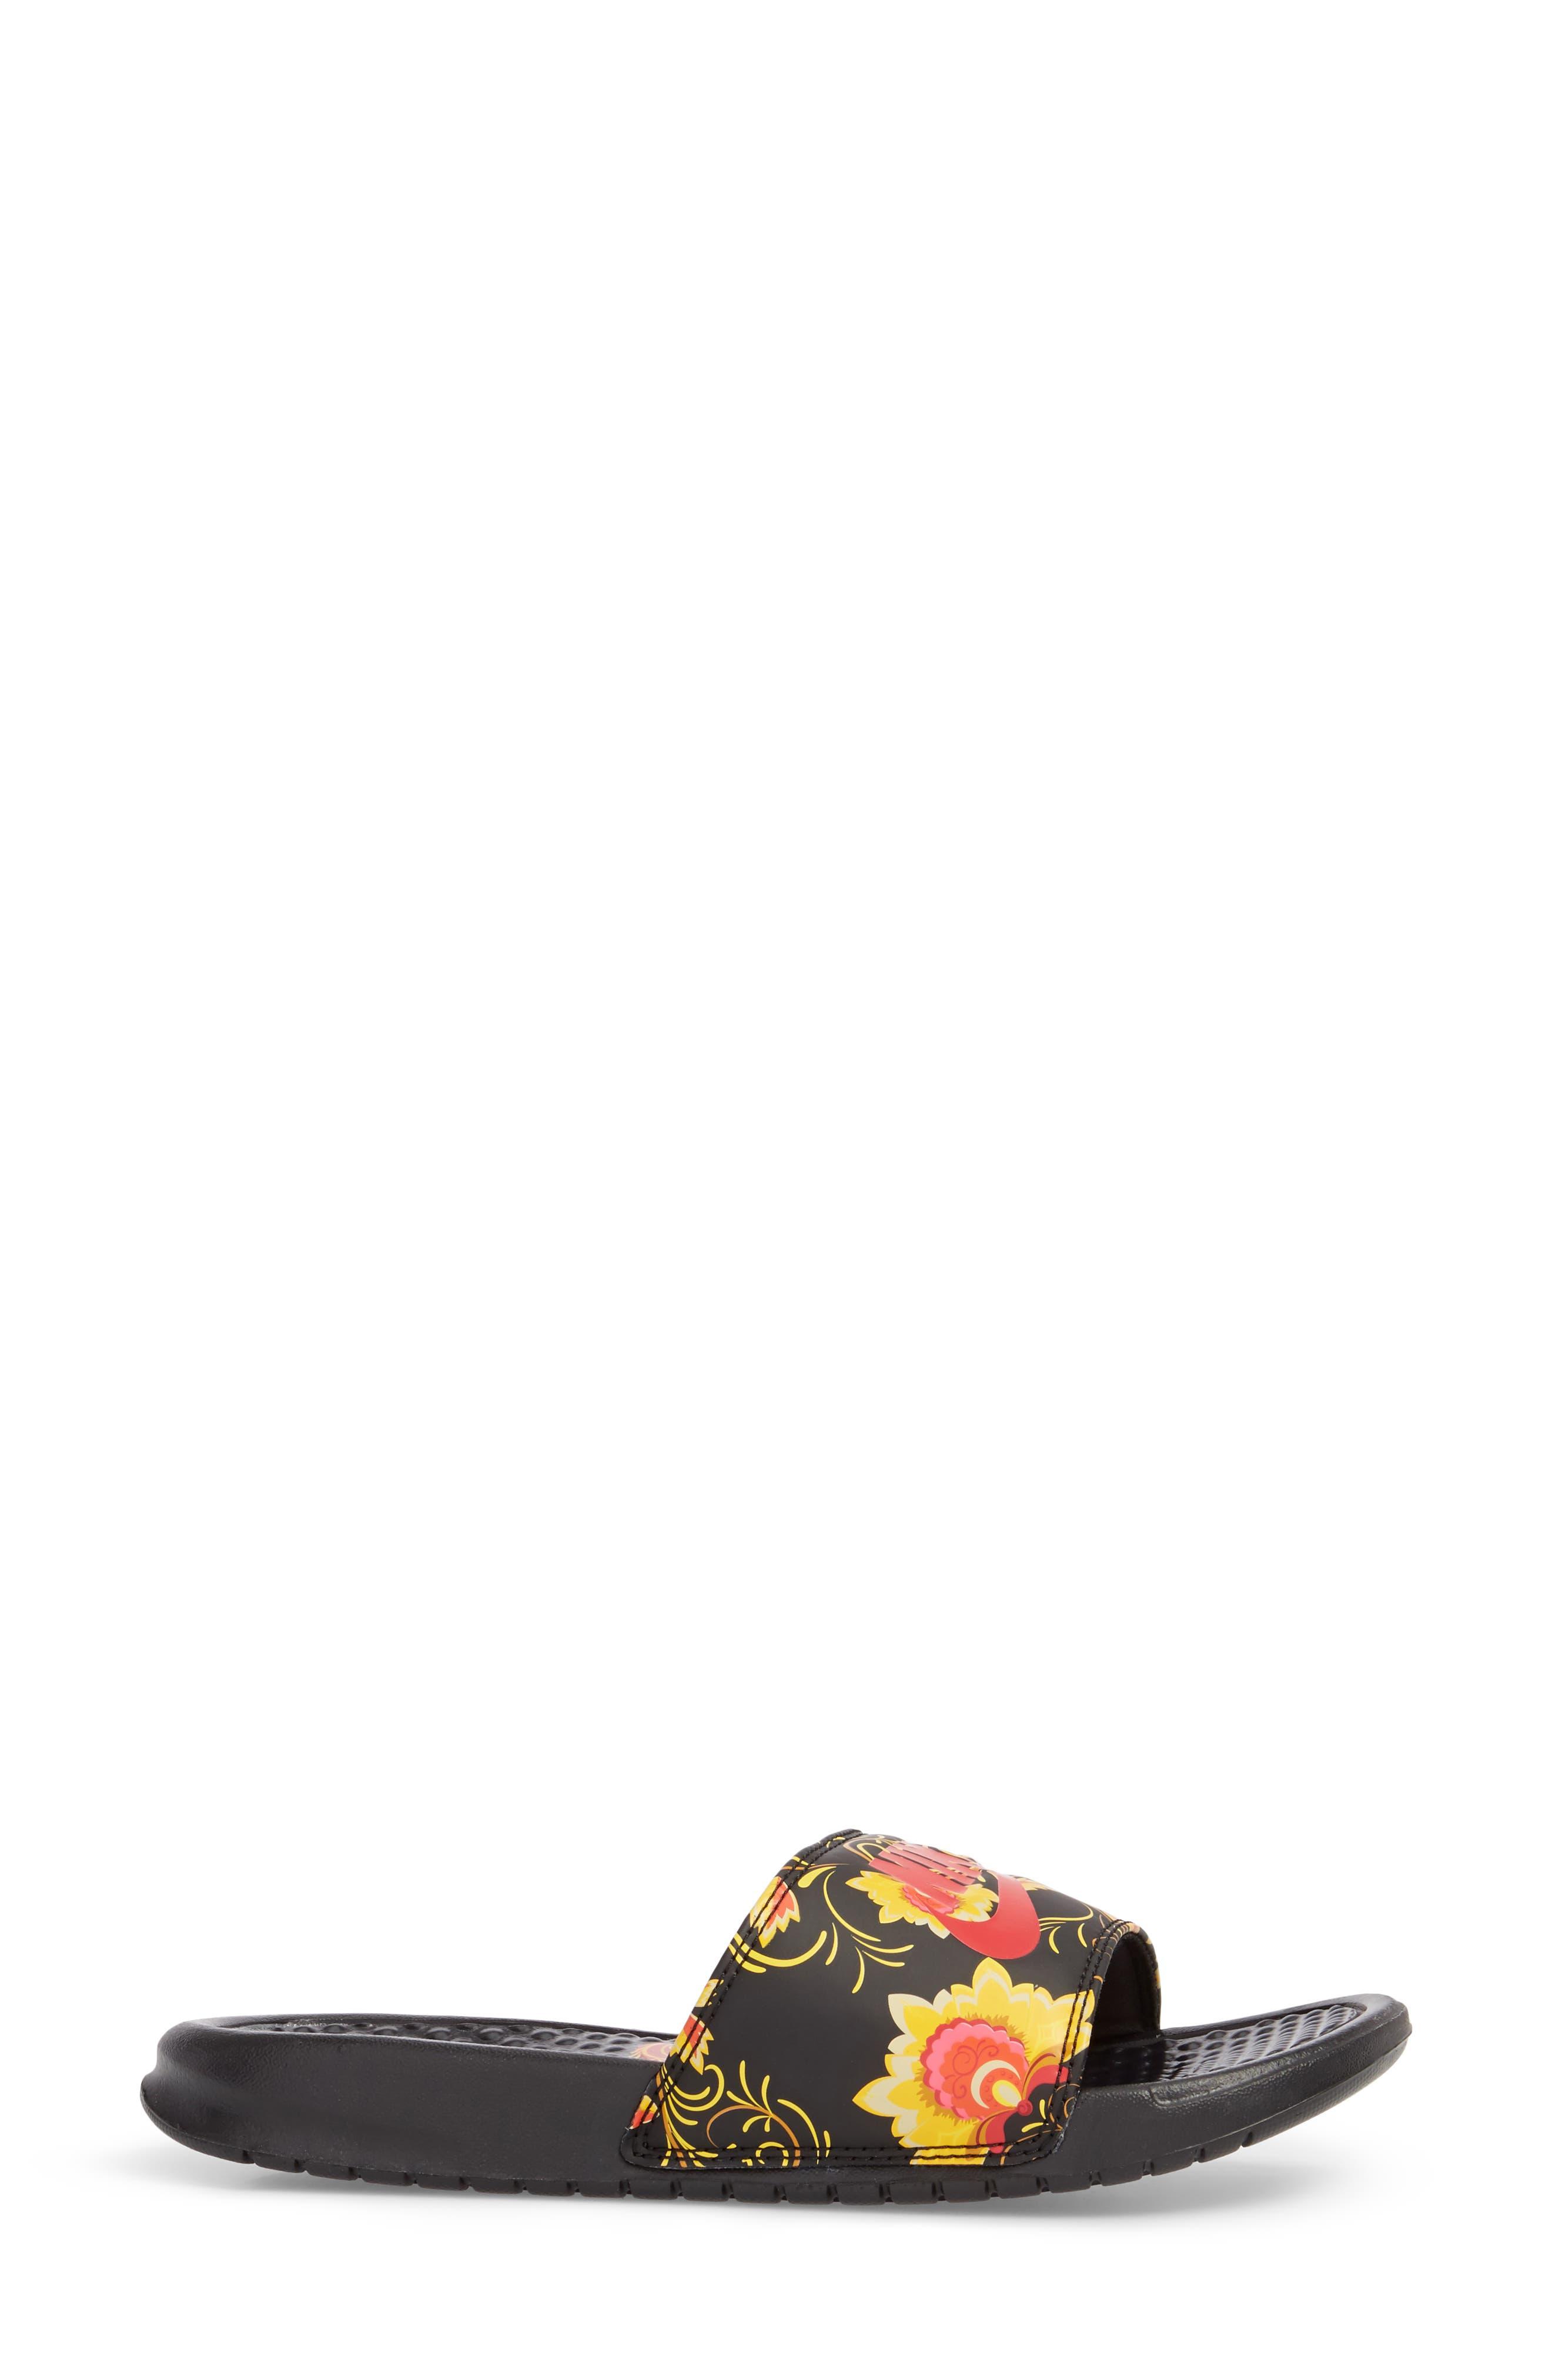 Benassi Floral Print Slide Sandal,                             Alternate thumbnail 3, color,                             600